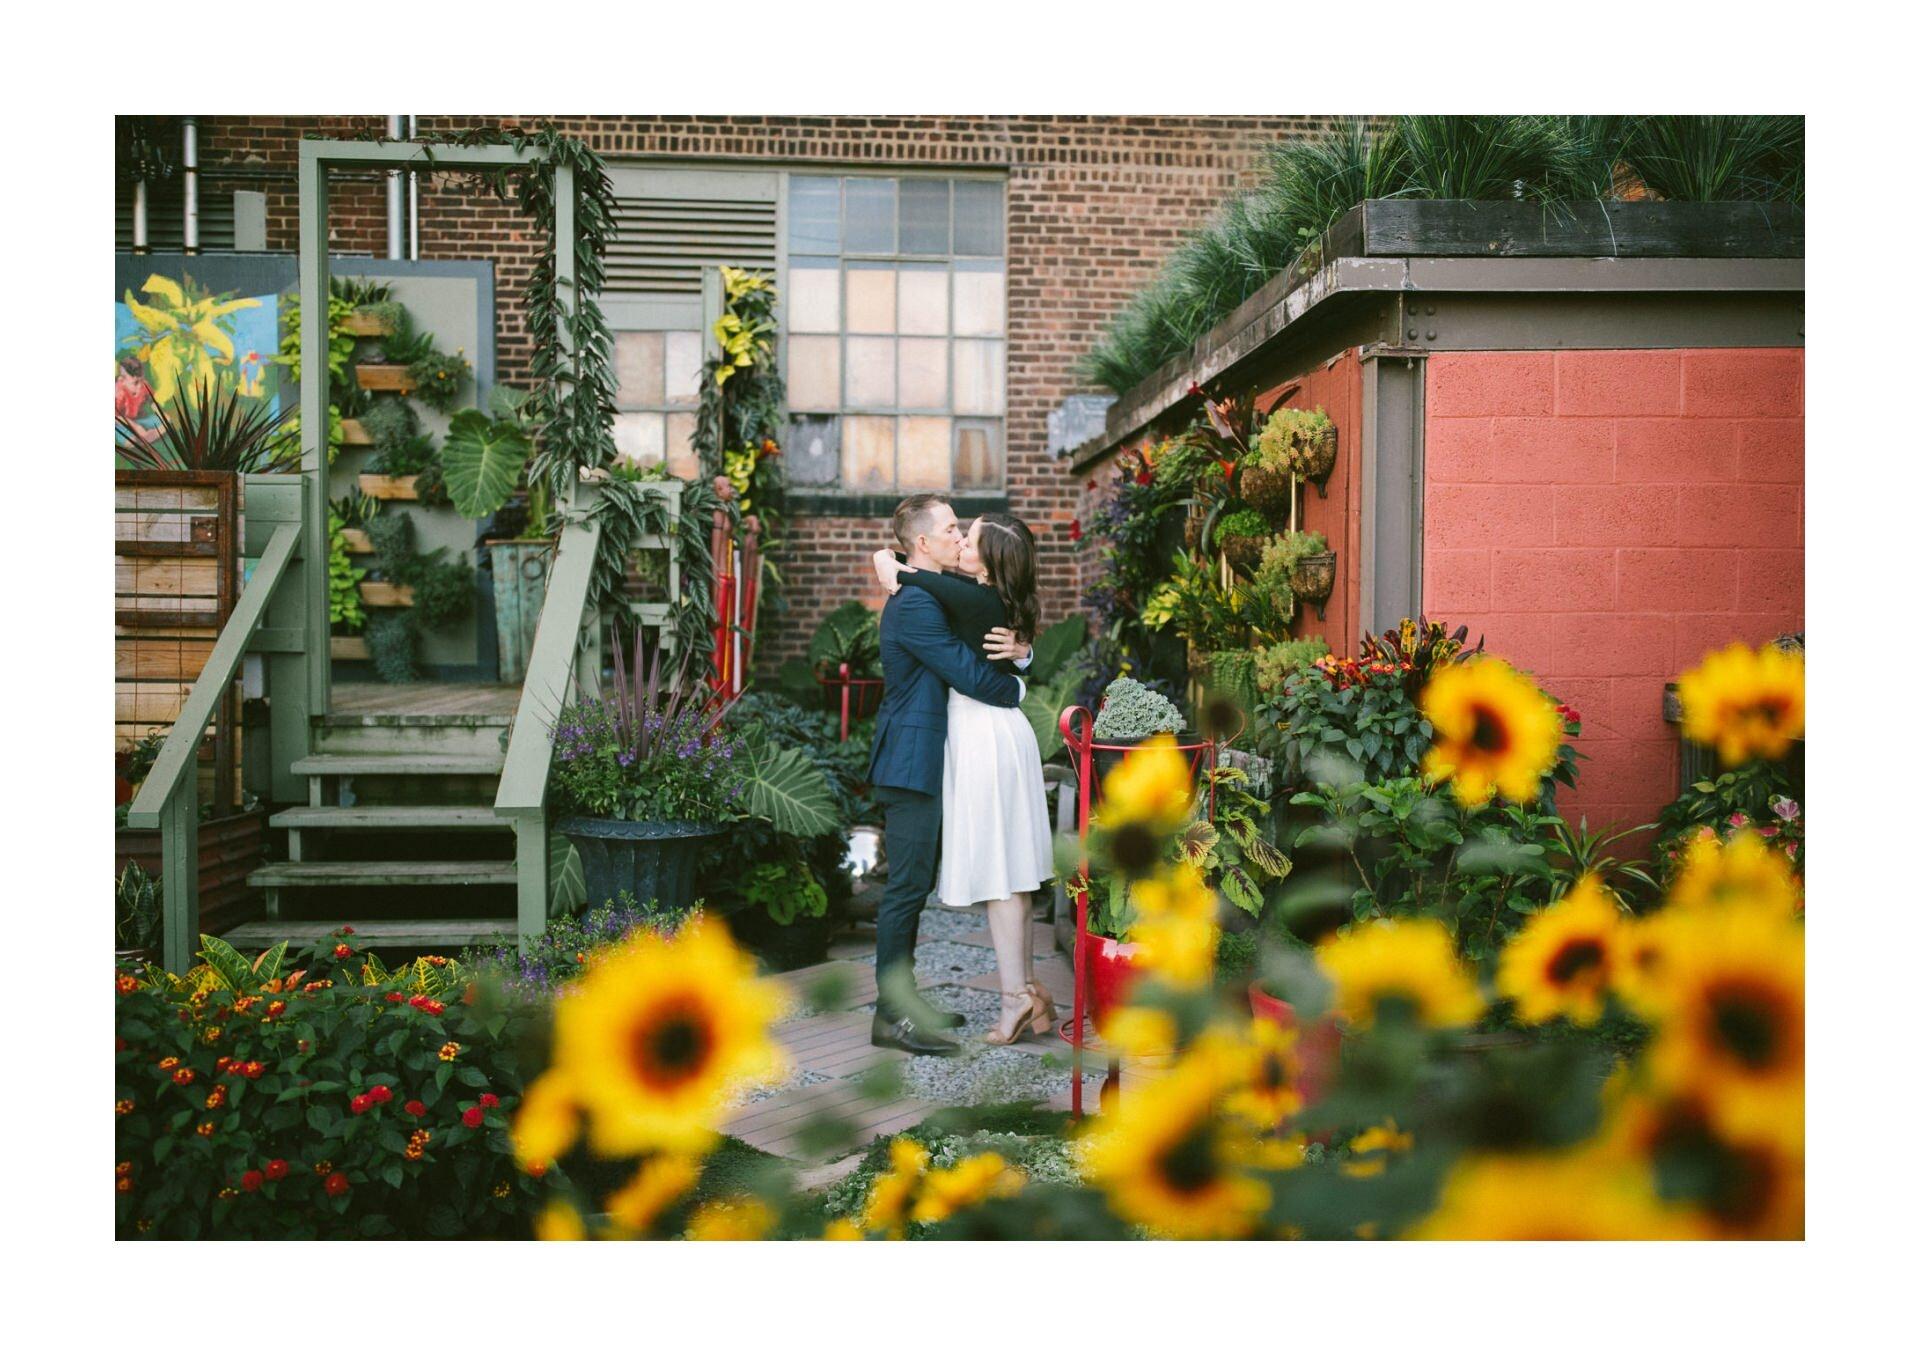 78th Street Studio Engagement and Wedding Photographer 10.jpg